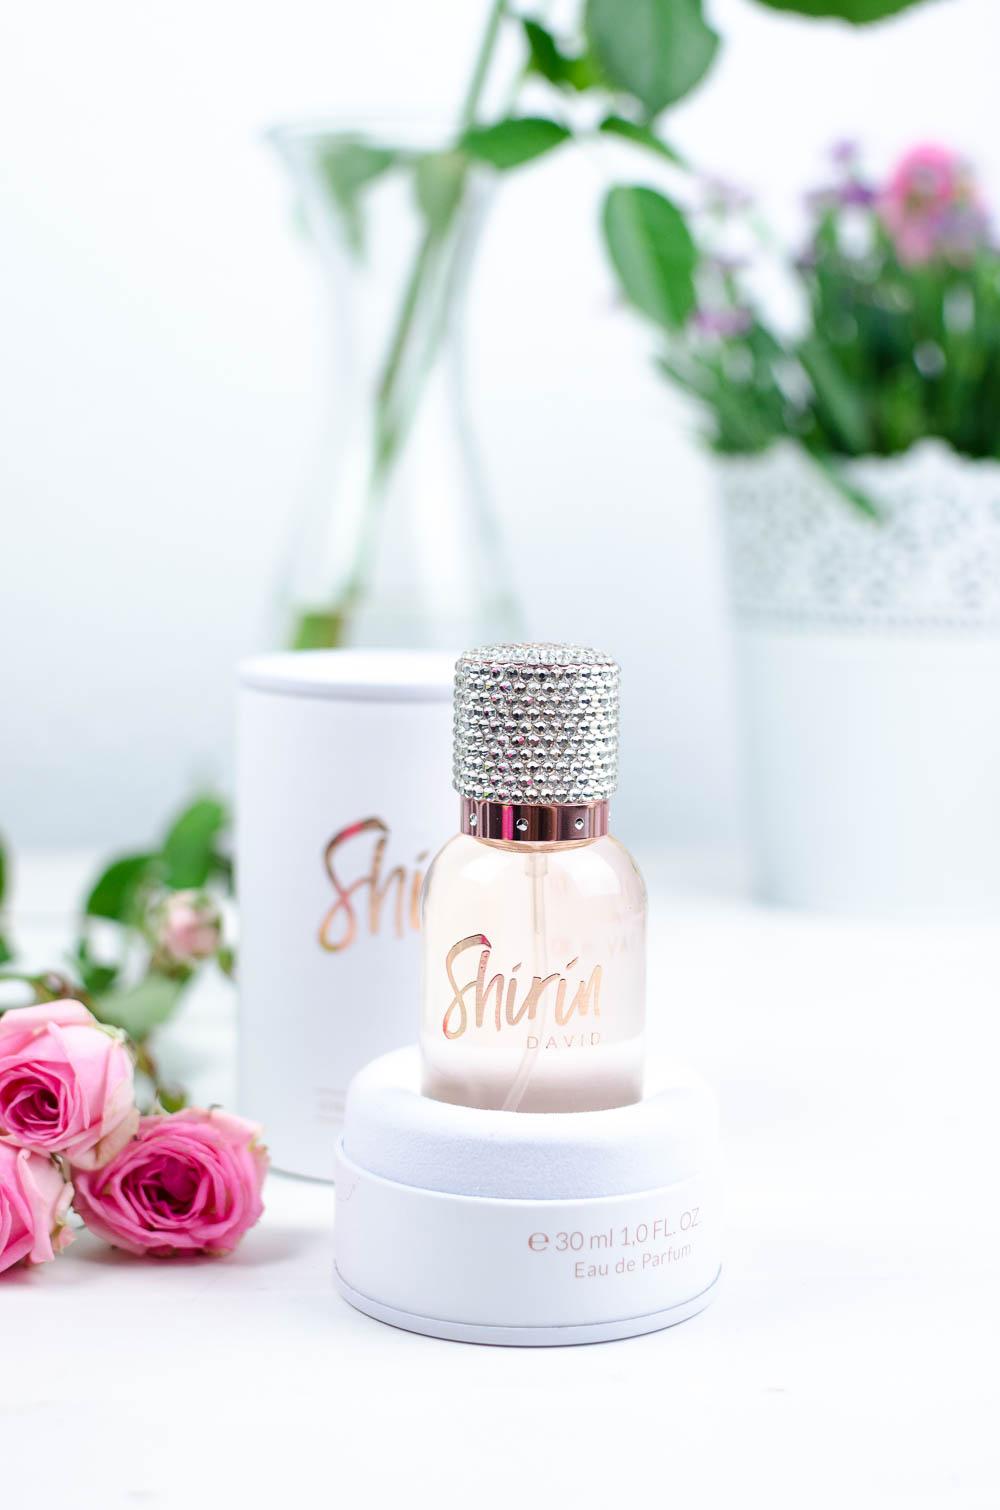 andysparkles-Beautypress Favoriten-Beautypress Event-KölnSky-Beautyblog-Shirin David